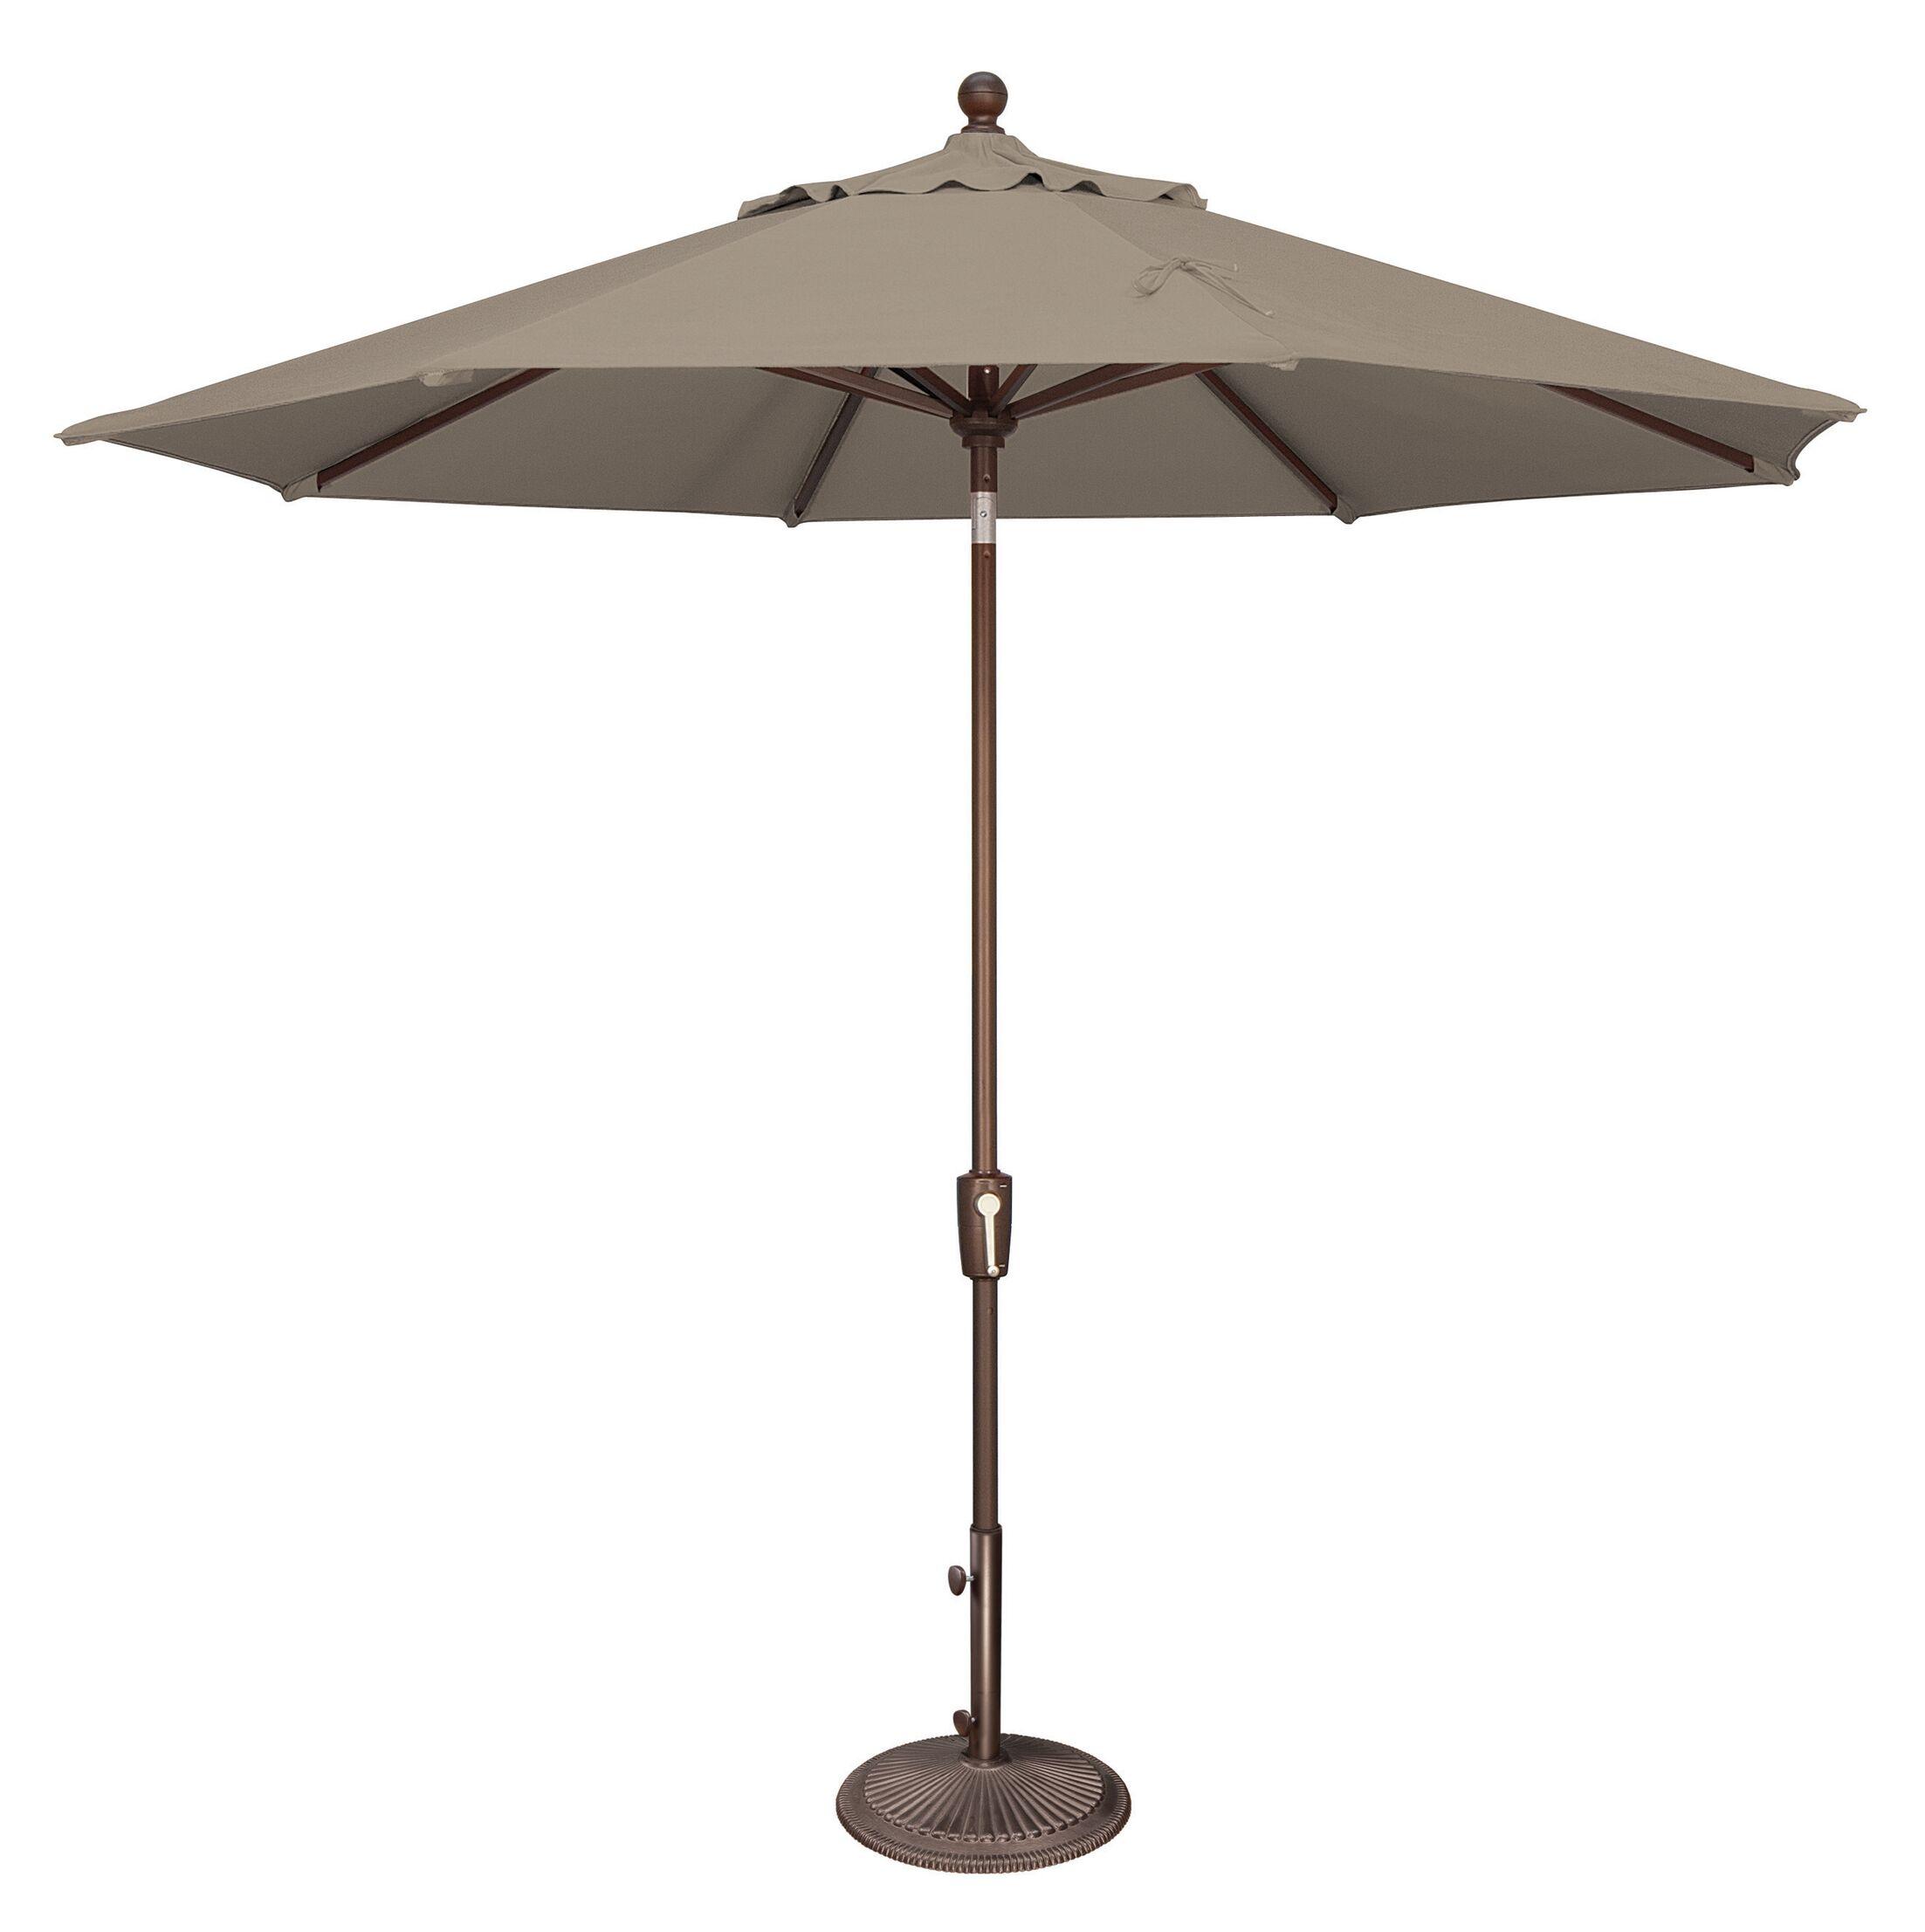 Catalina 9' Market Umbrella Fabric Color: Sunbrella / Cocoa